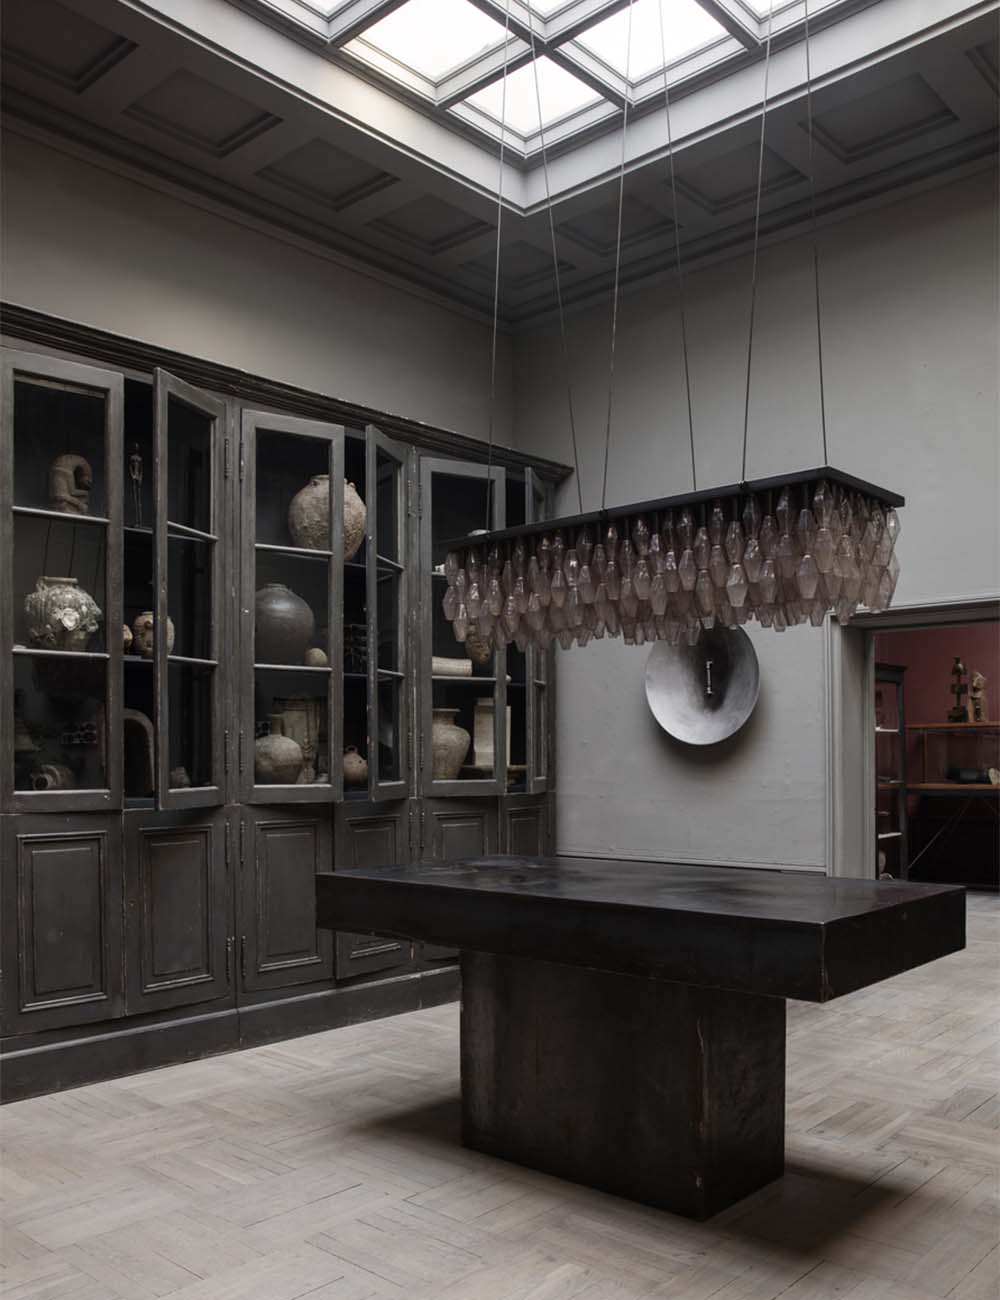 Murano glass lamp and wunderkammer of antiques at Studio Oliver Gustav